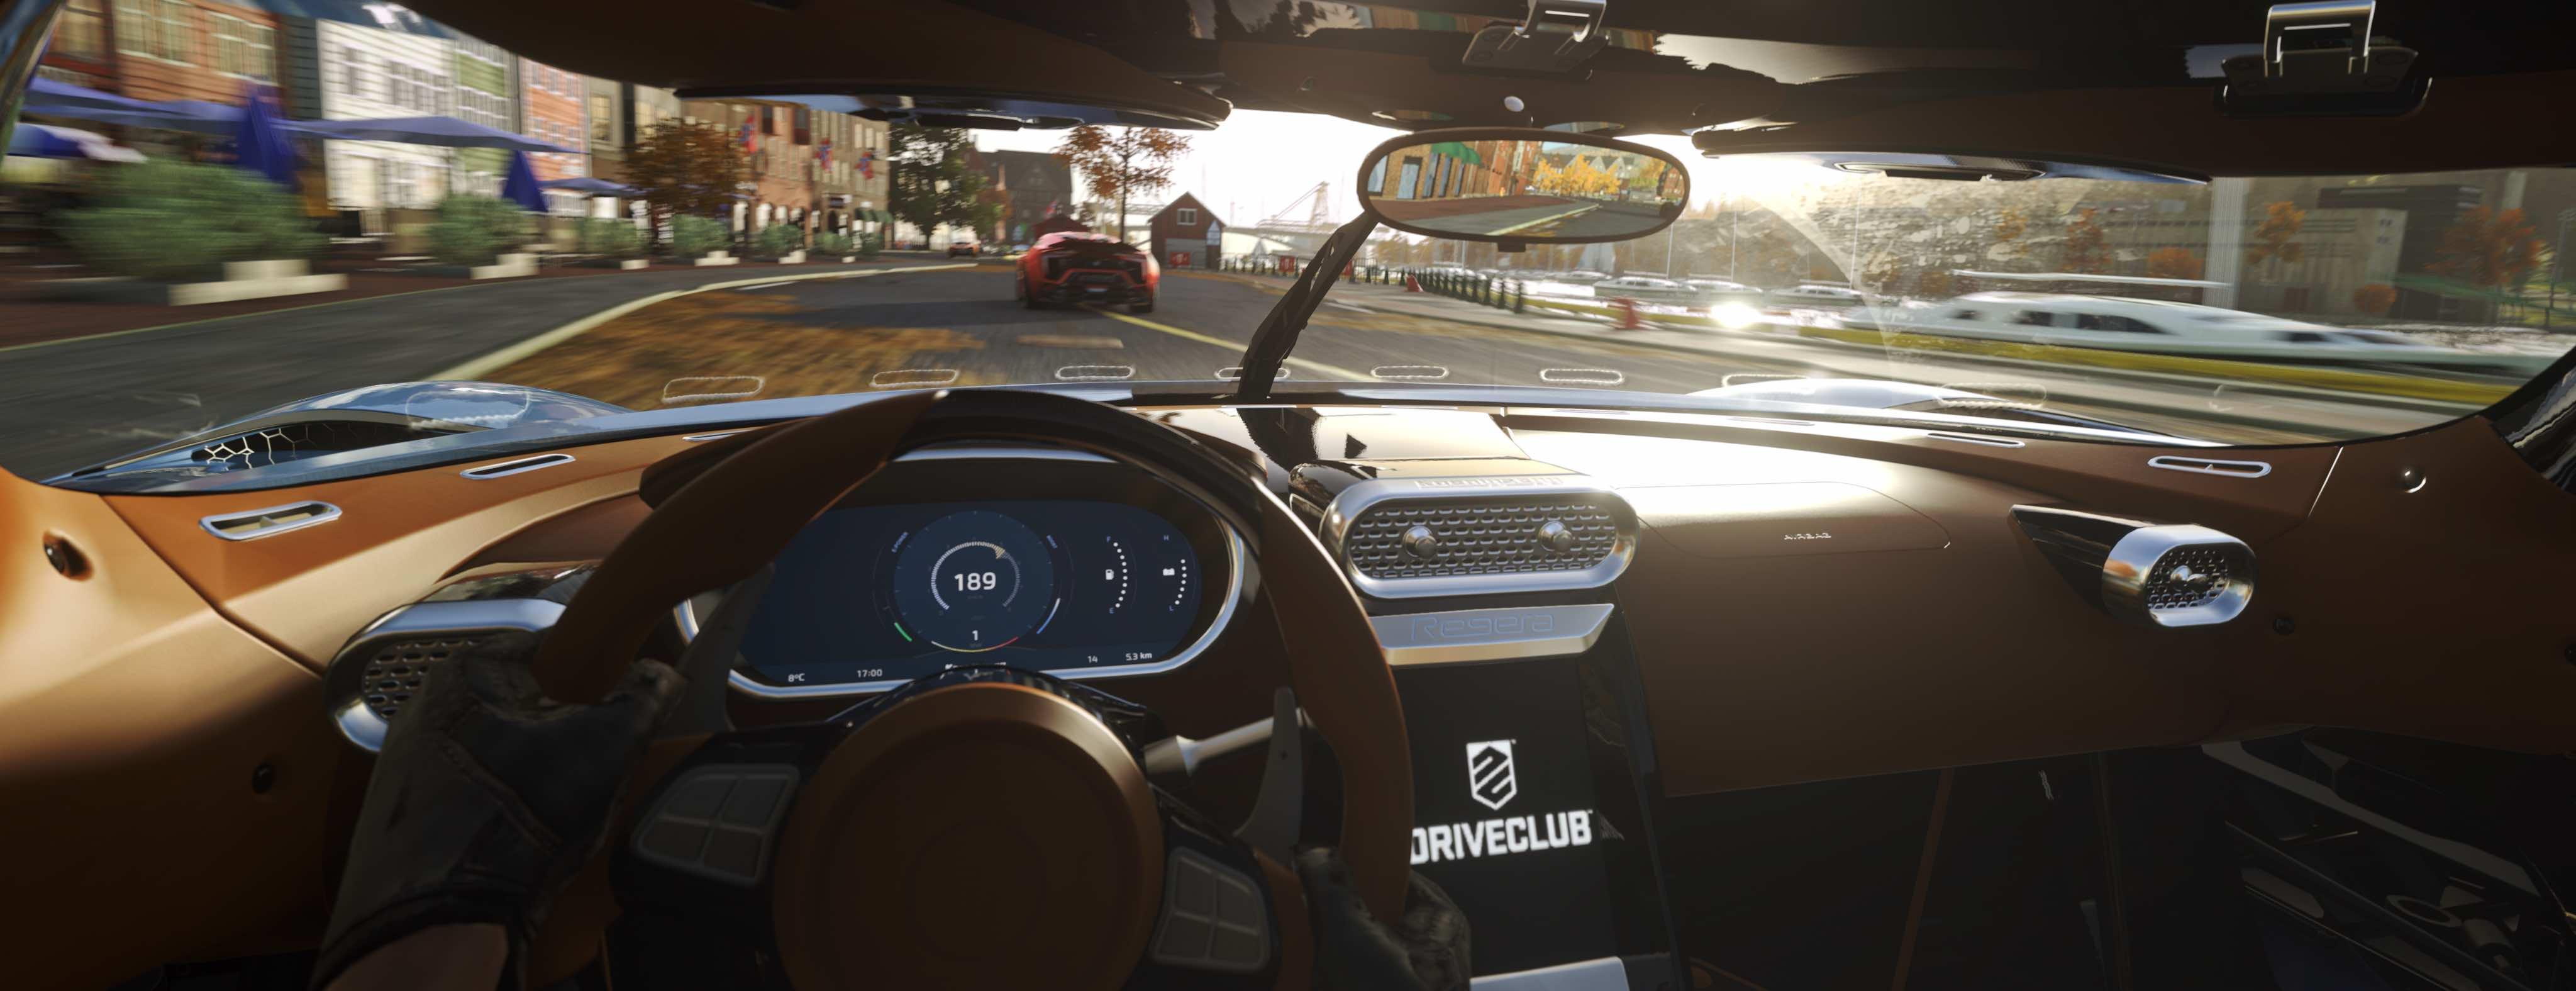 Driveclub_VR_2